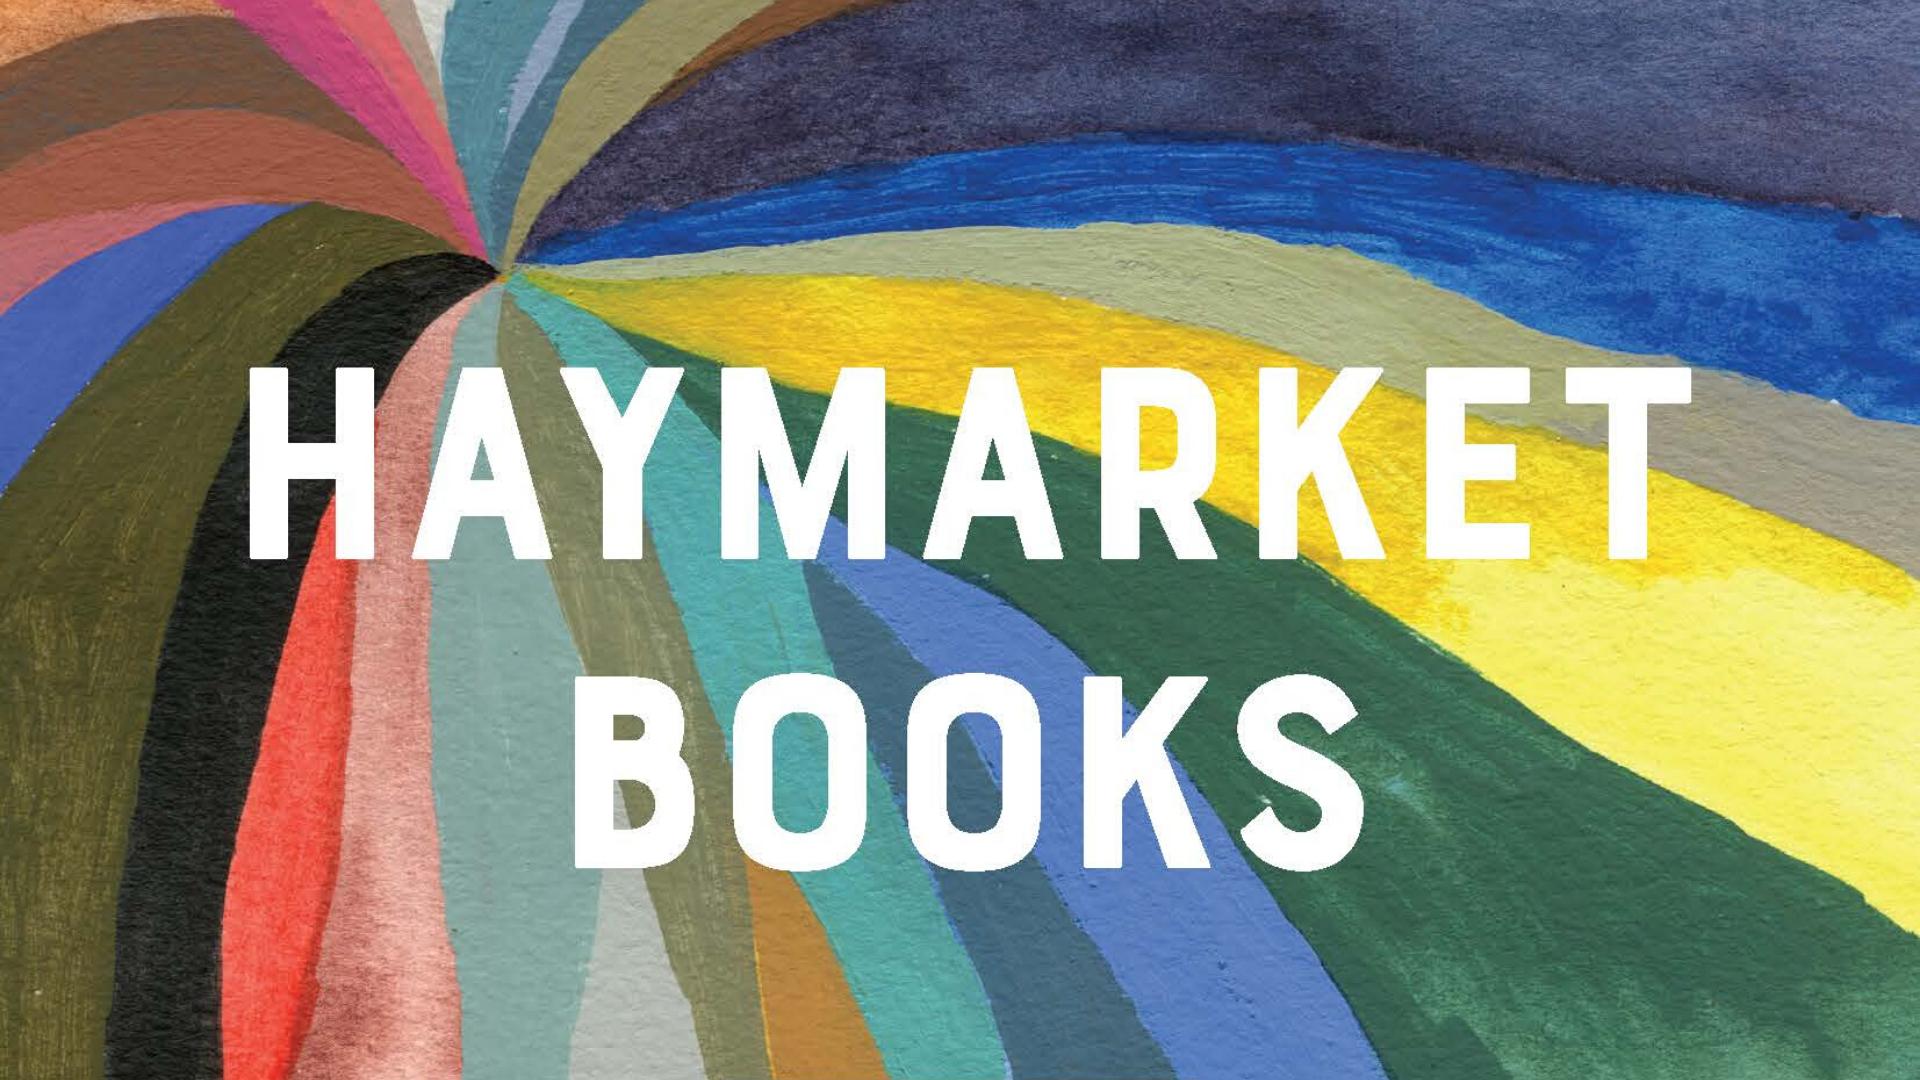 Haymarket_books-